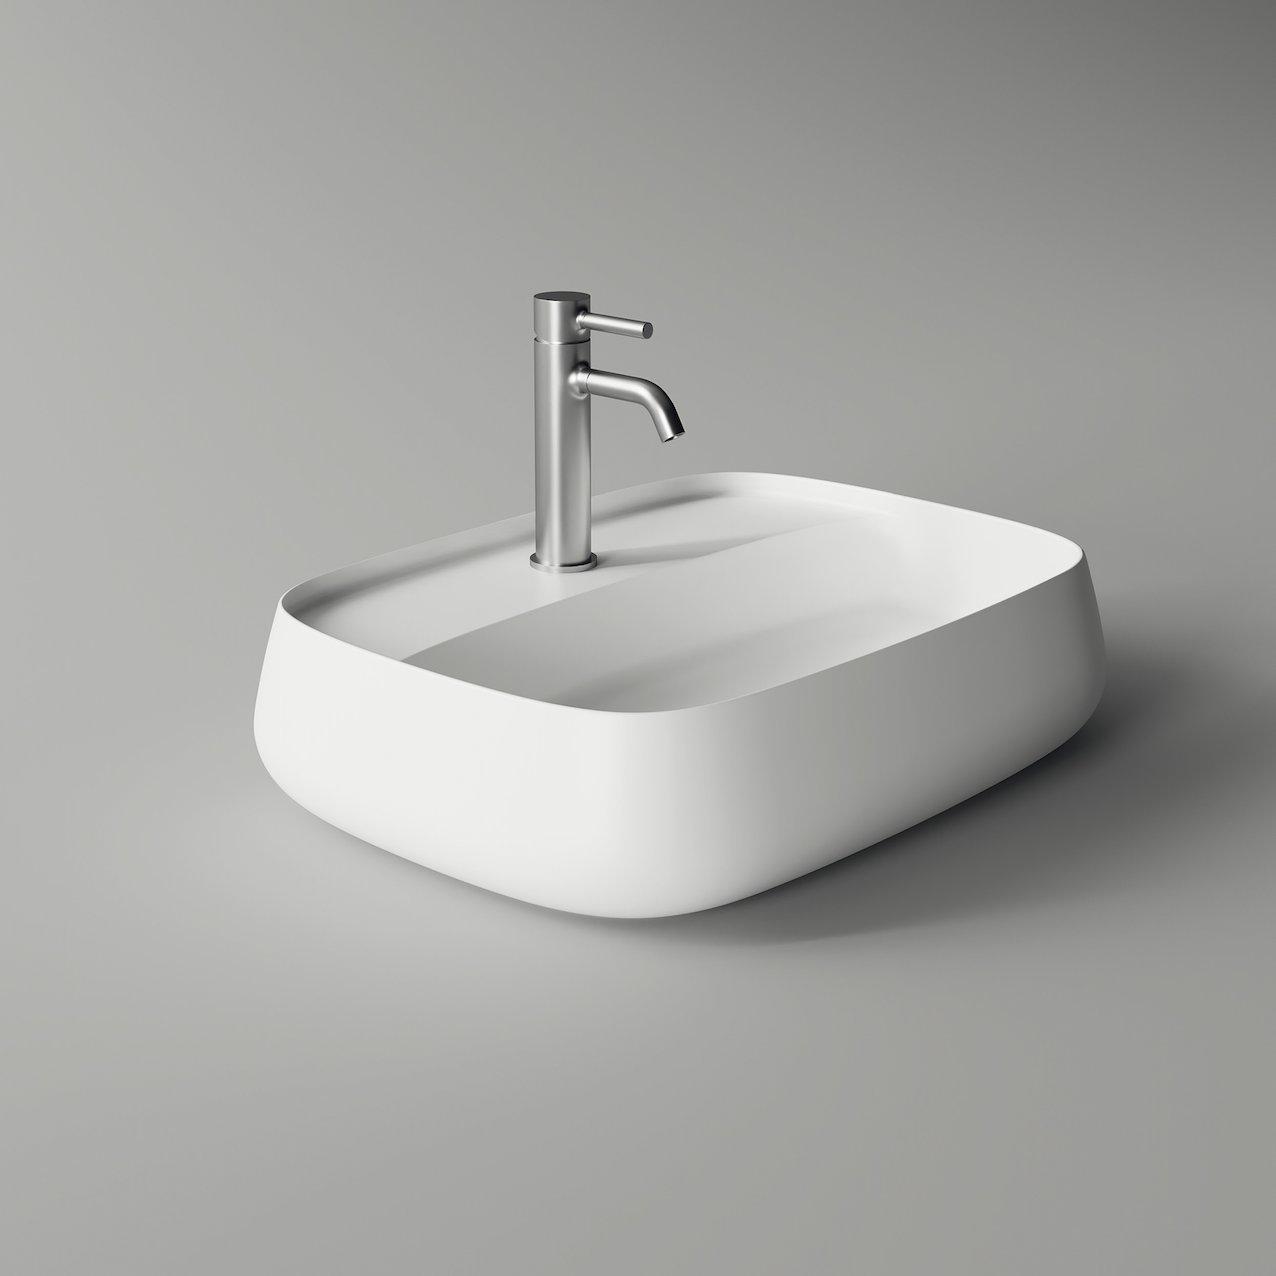 Lavabo NUR 60x45 cm